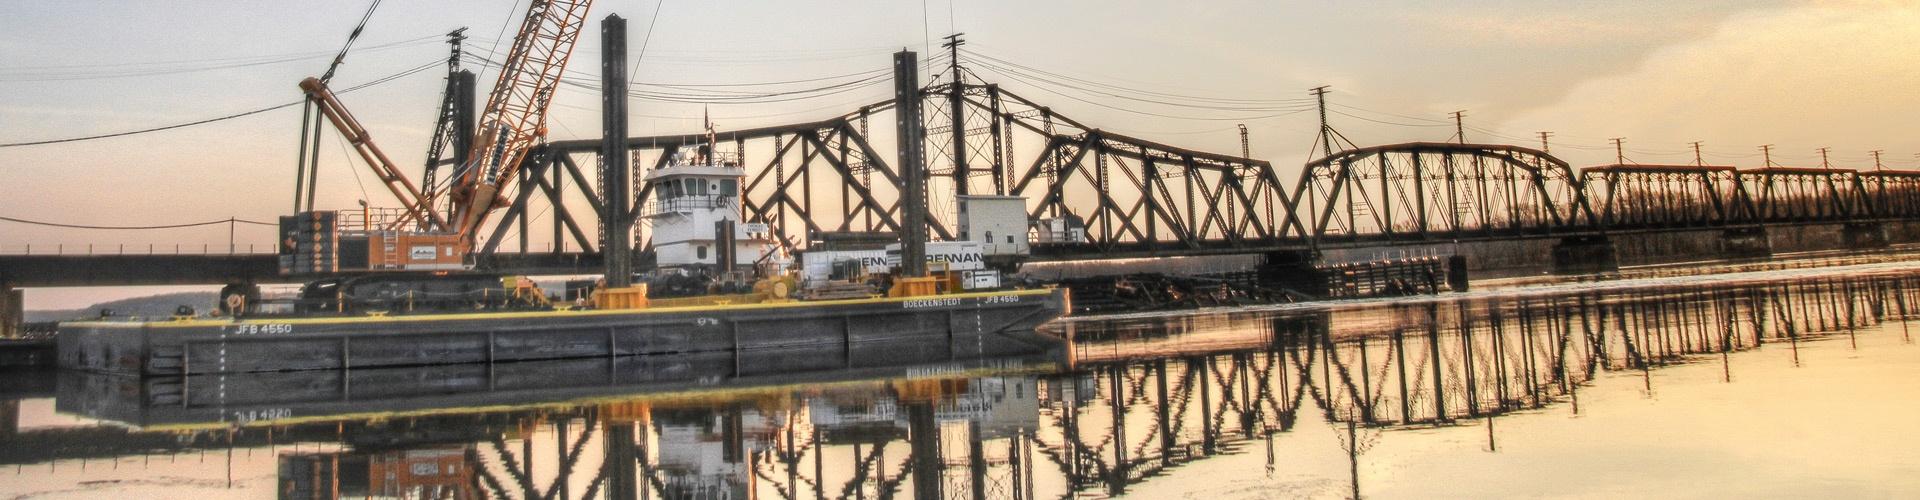 railroad construction services, railroad contractors, bridge replacements, bridge repairs, railroad bridge repairs, derailment assists, derailment cleanups, brennan,